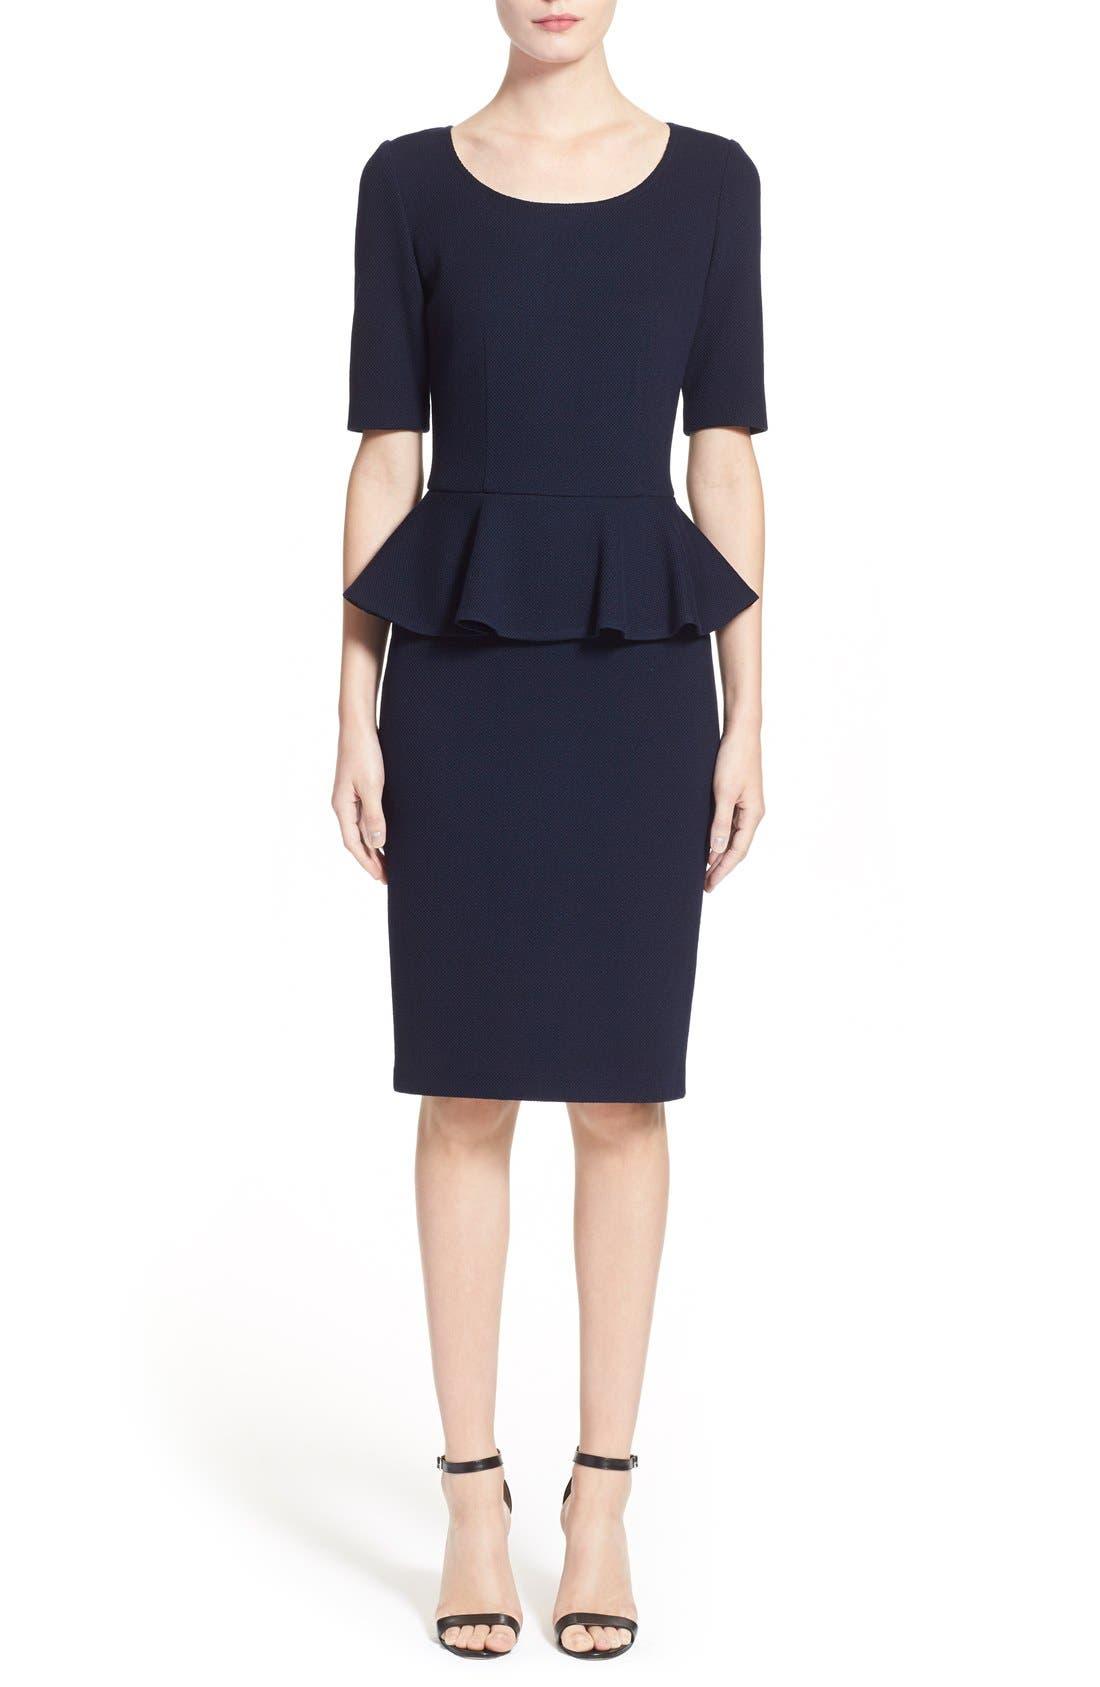 Main Image - St. John Collection Peplum Milano Piqué Knit Dress